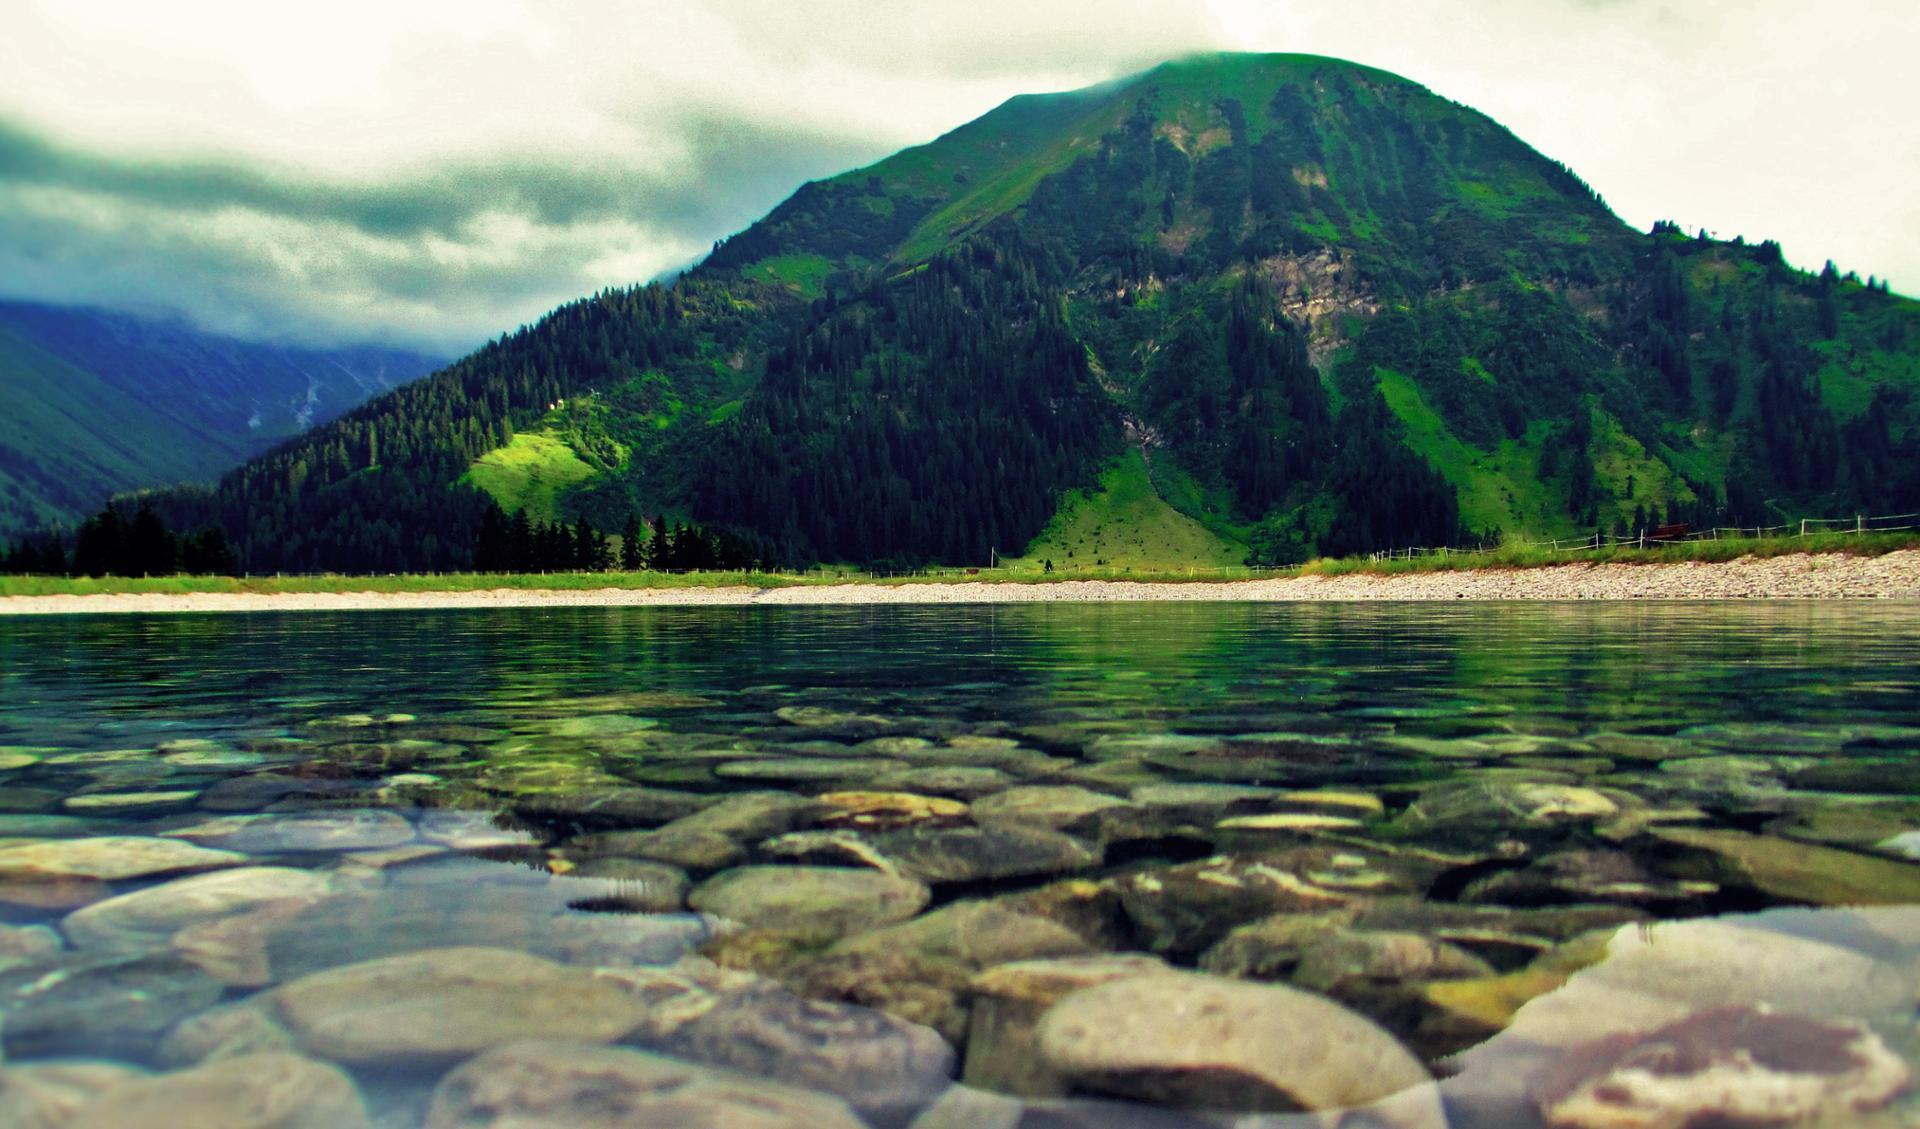 hönig berg